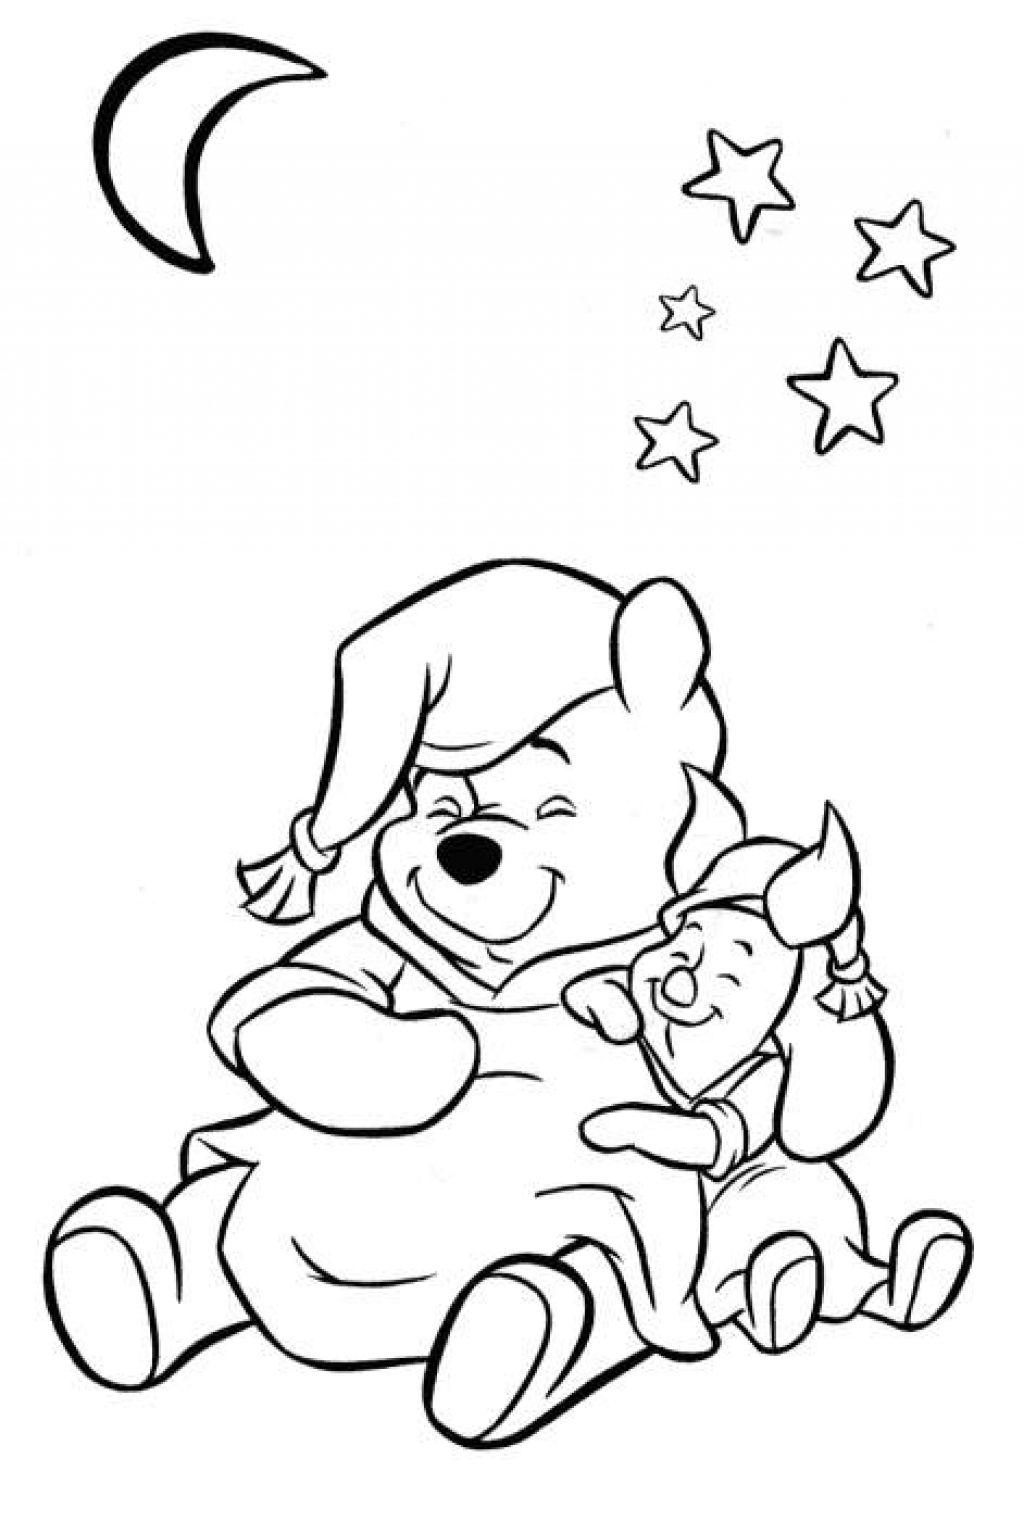 slaapmuts | muur en zo | Pinterest | Adult coloring, Disney crafts ...